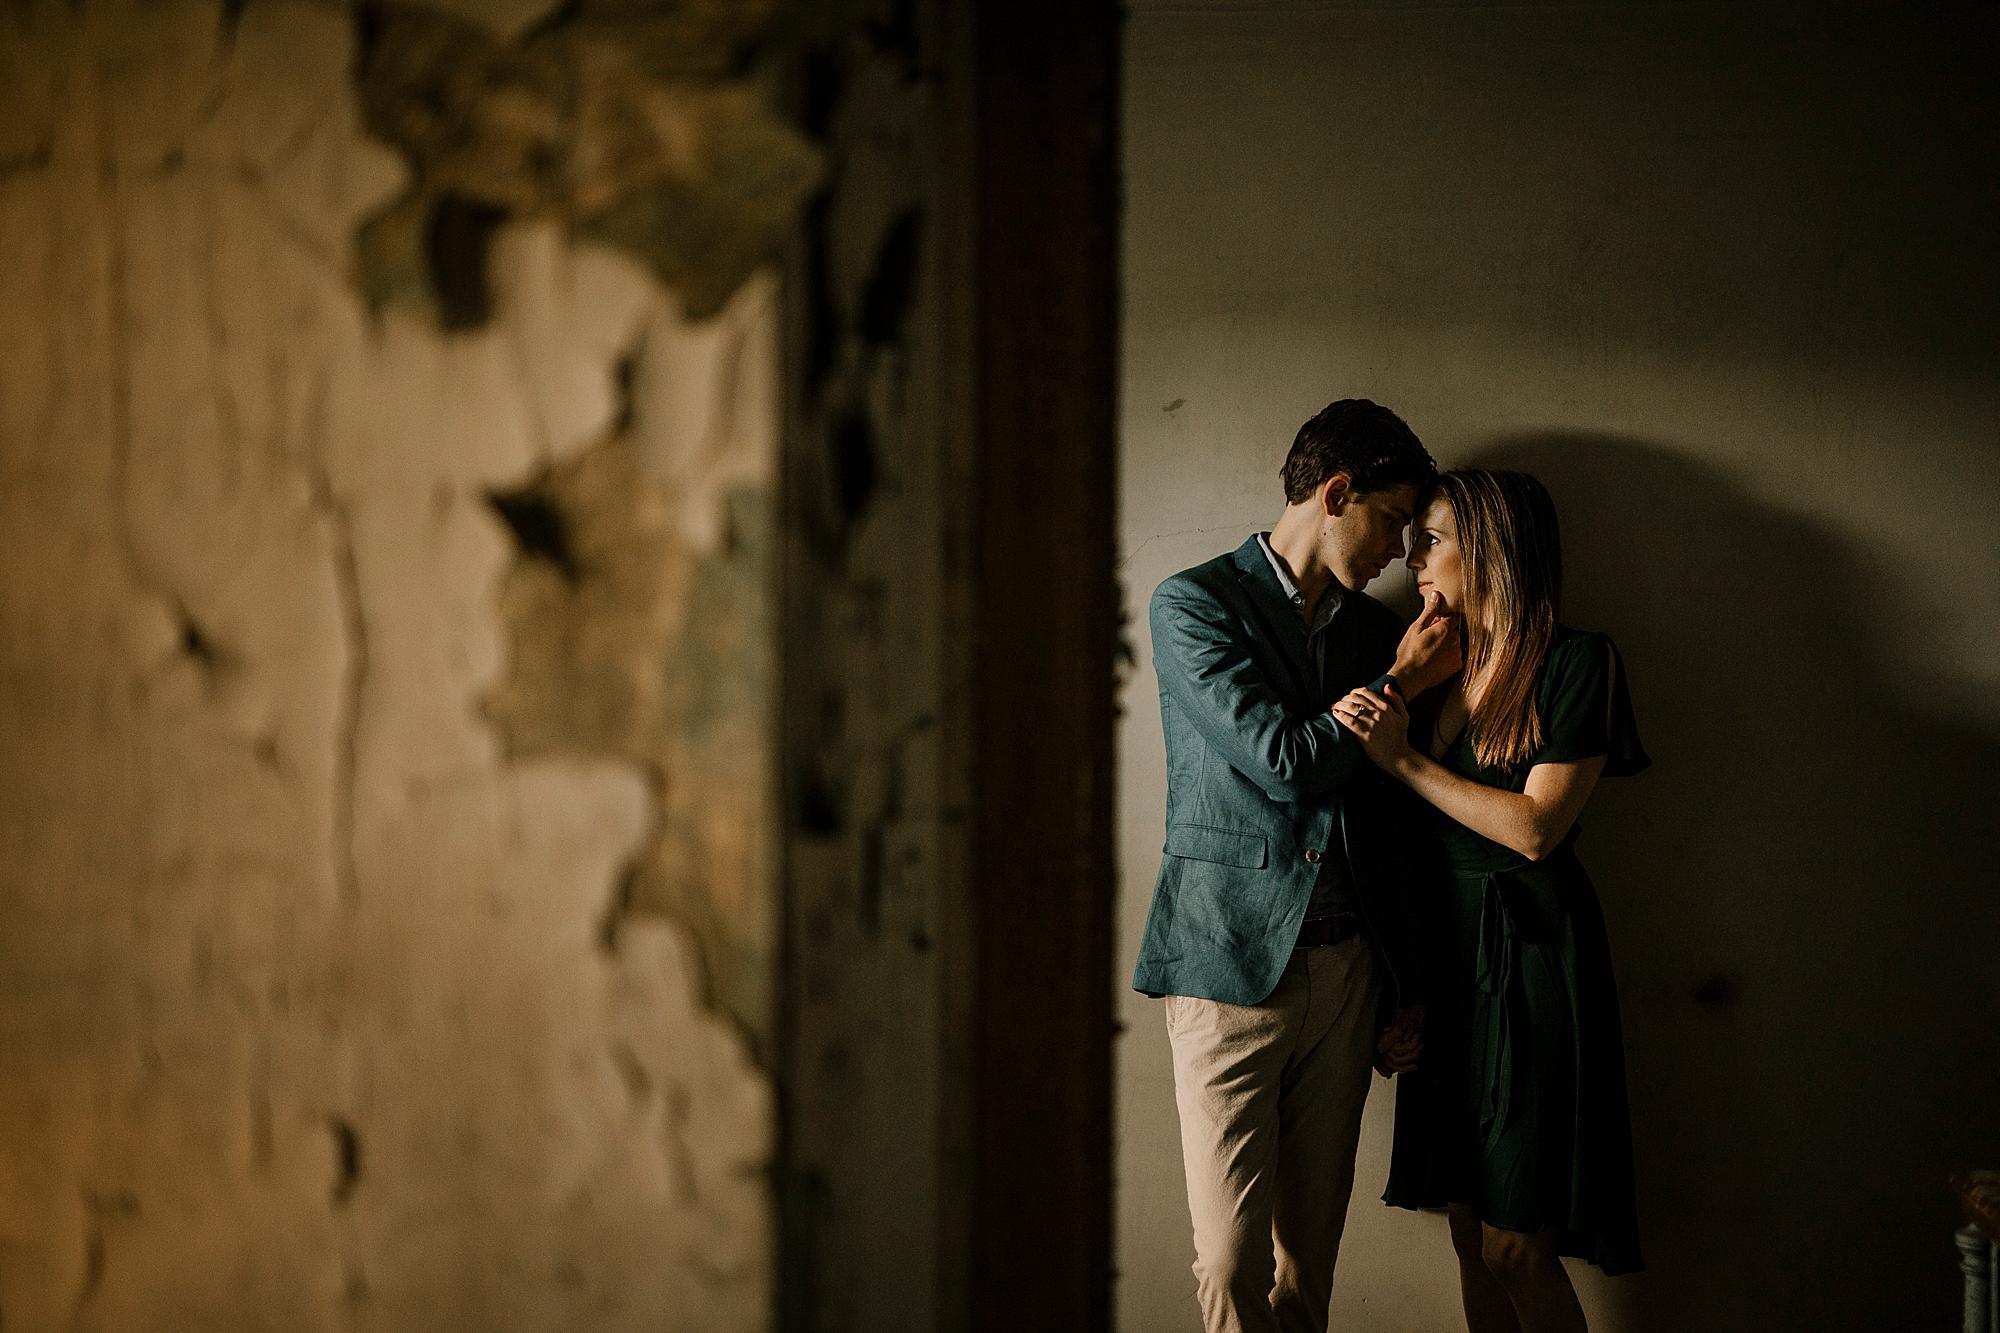 Tori_Zack_Glen_Mills_Terrain Cafe_Wedding_Engagement_Photography_Joe_Mac_Creative__0055.jpg